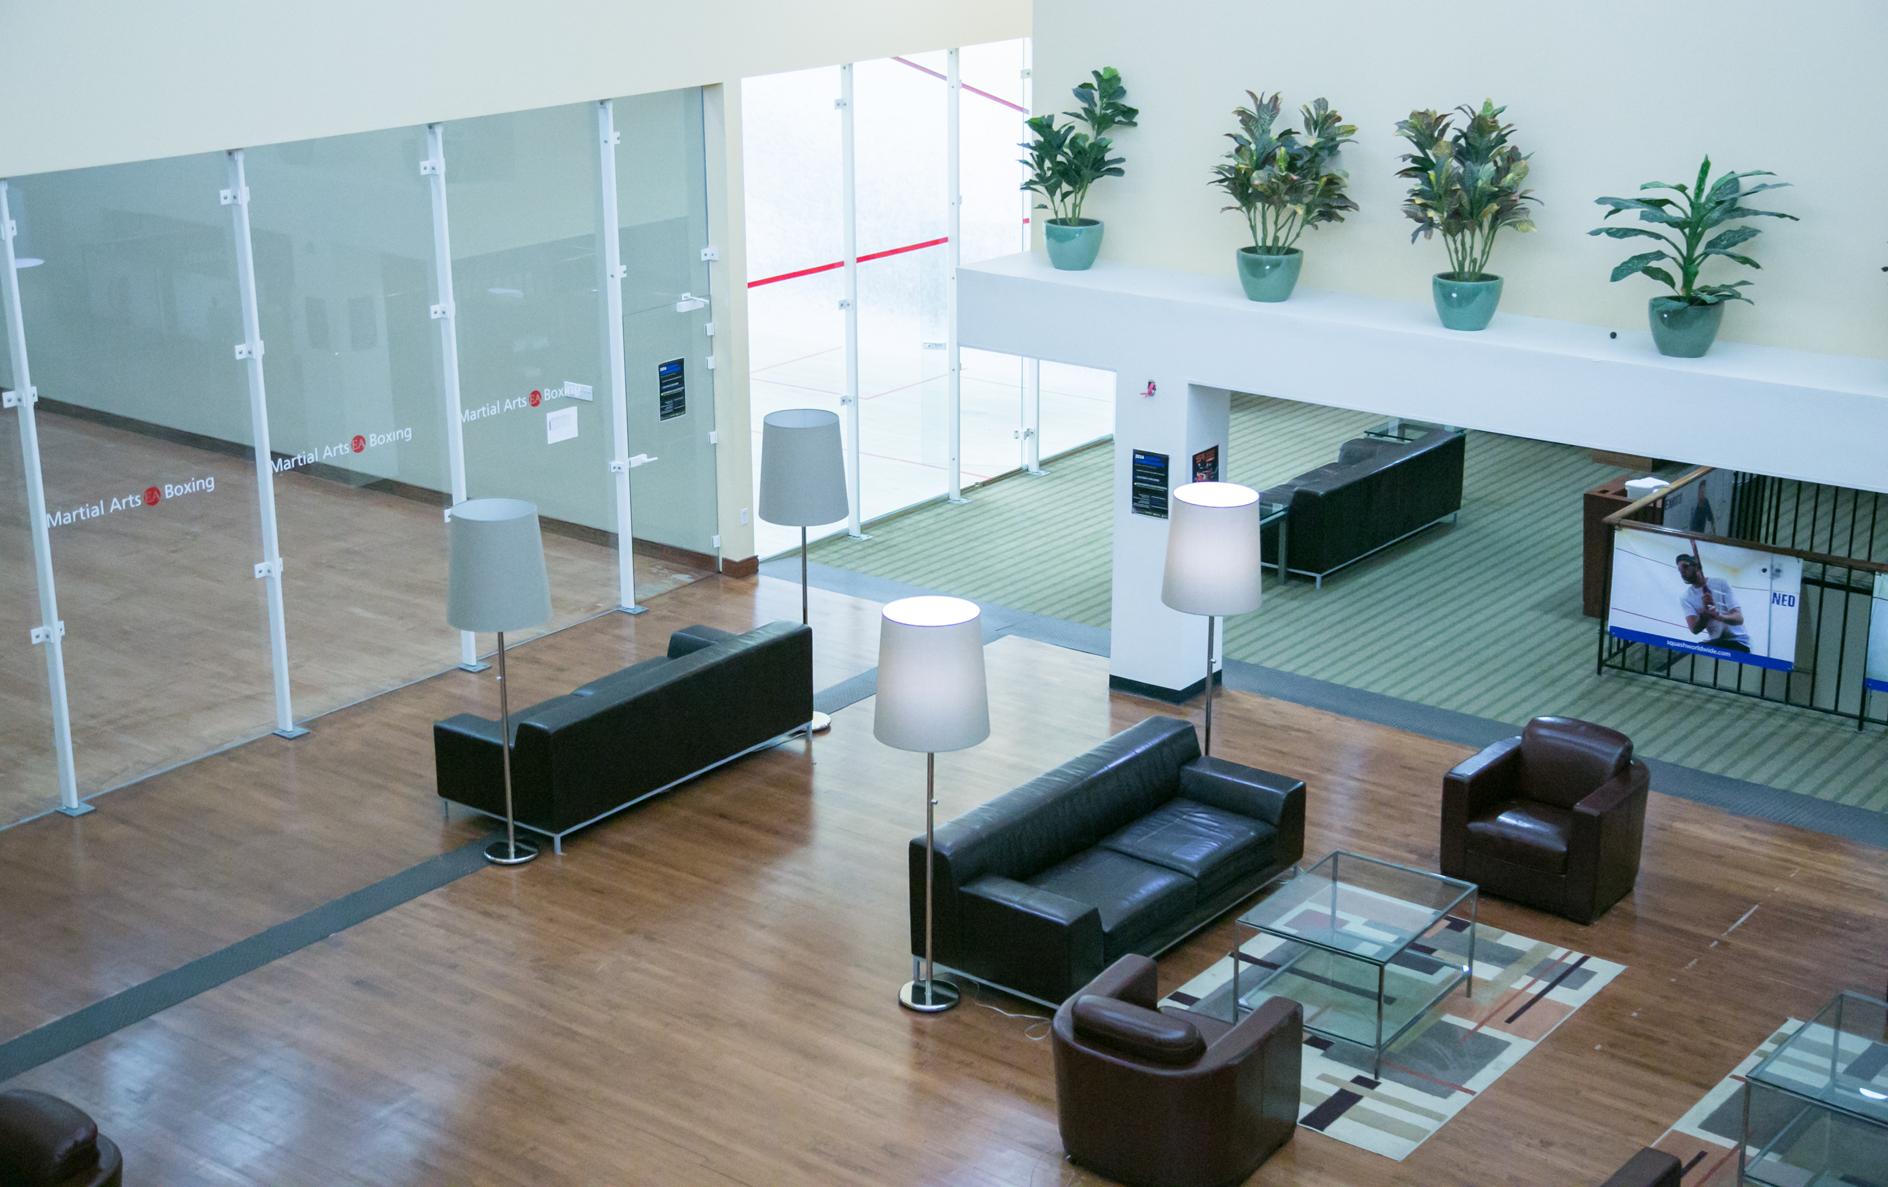 Squash courts & lounge area